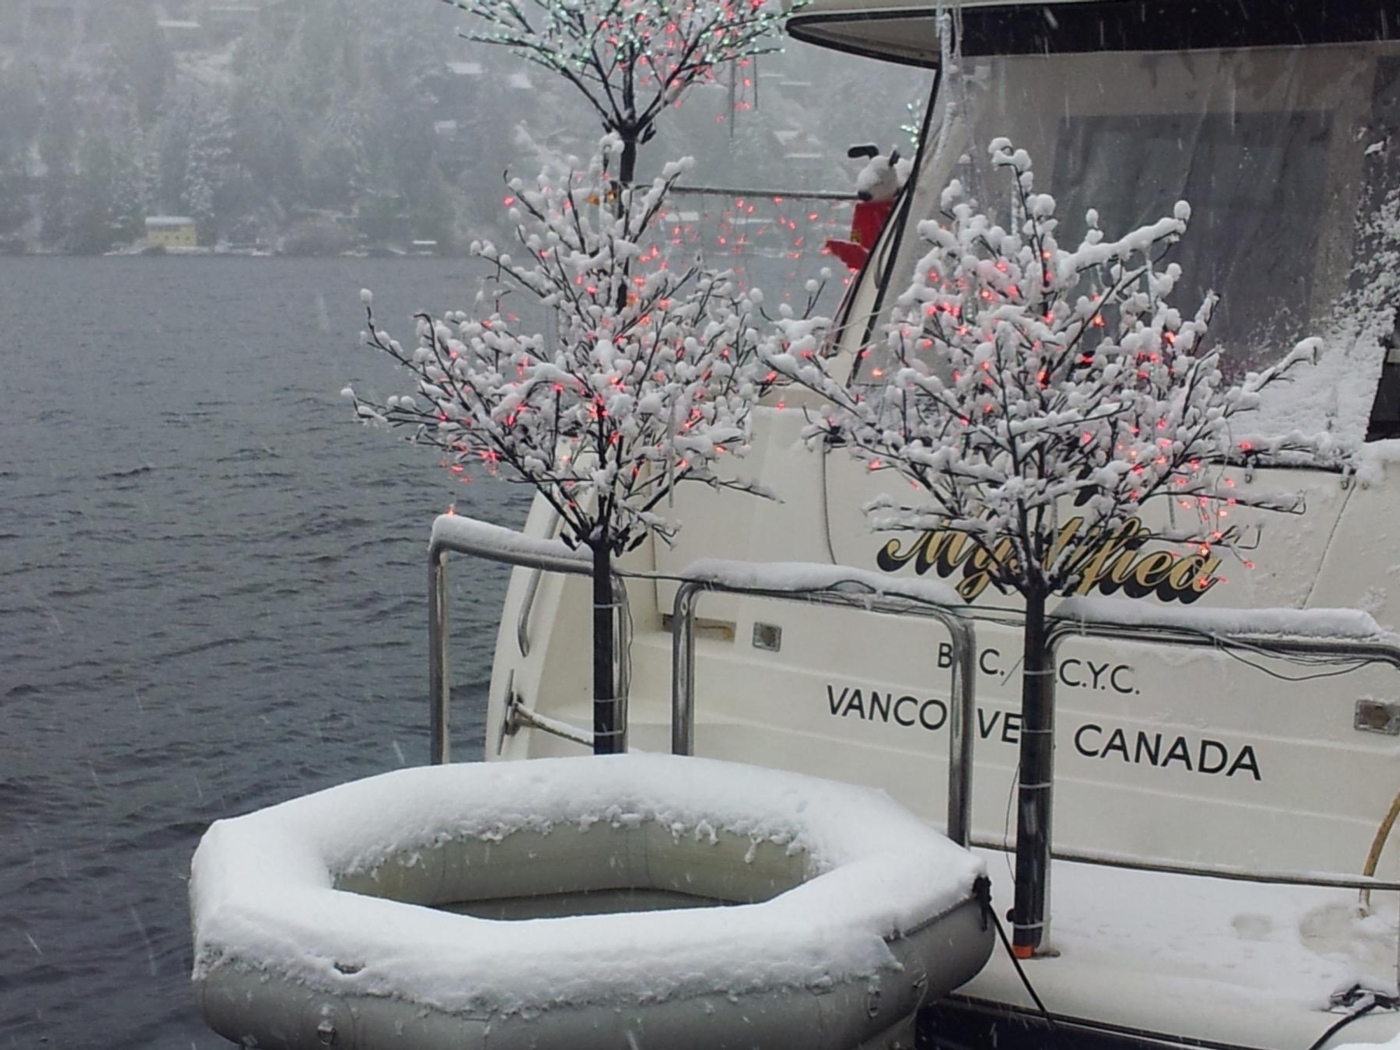 1999 Bayliner 5788 Pilot House Motoryacht, Winter Yachtub